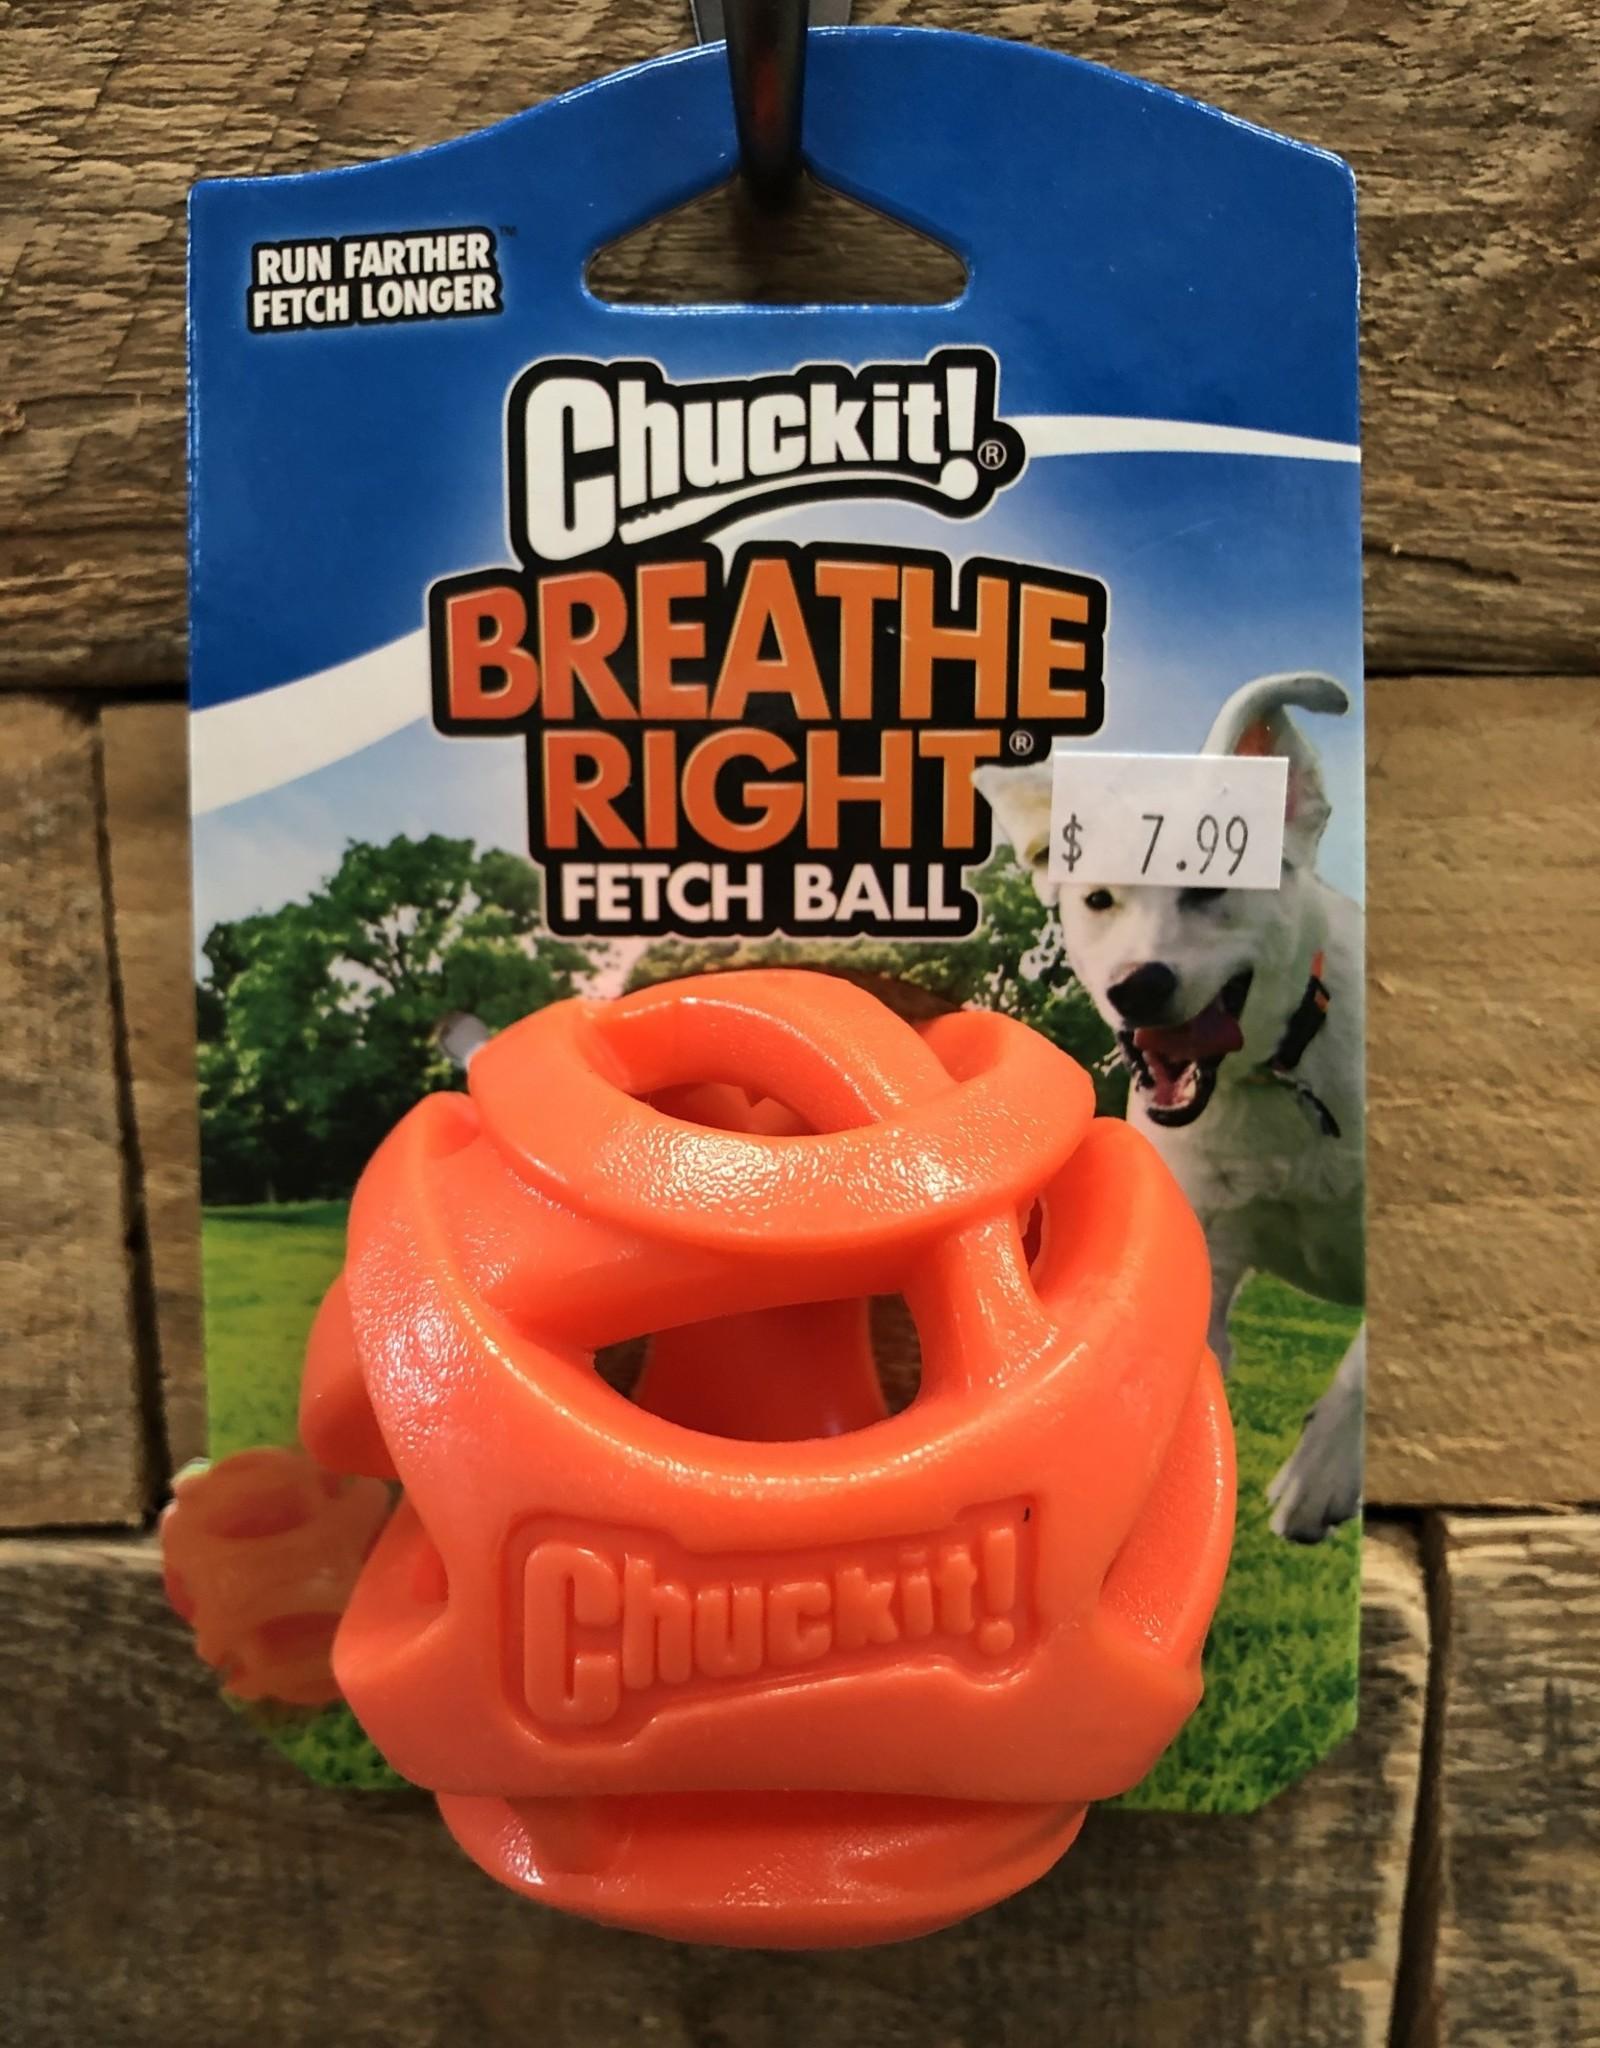 ChuckIt Chuck it breath right med